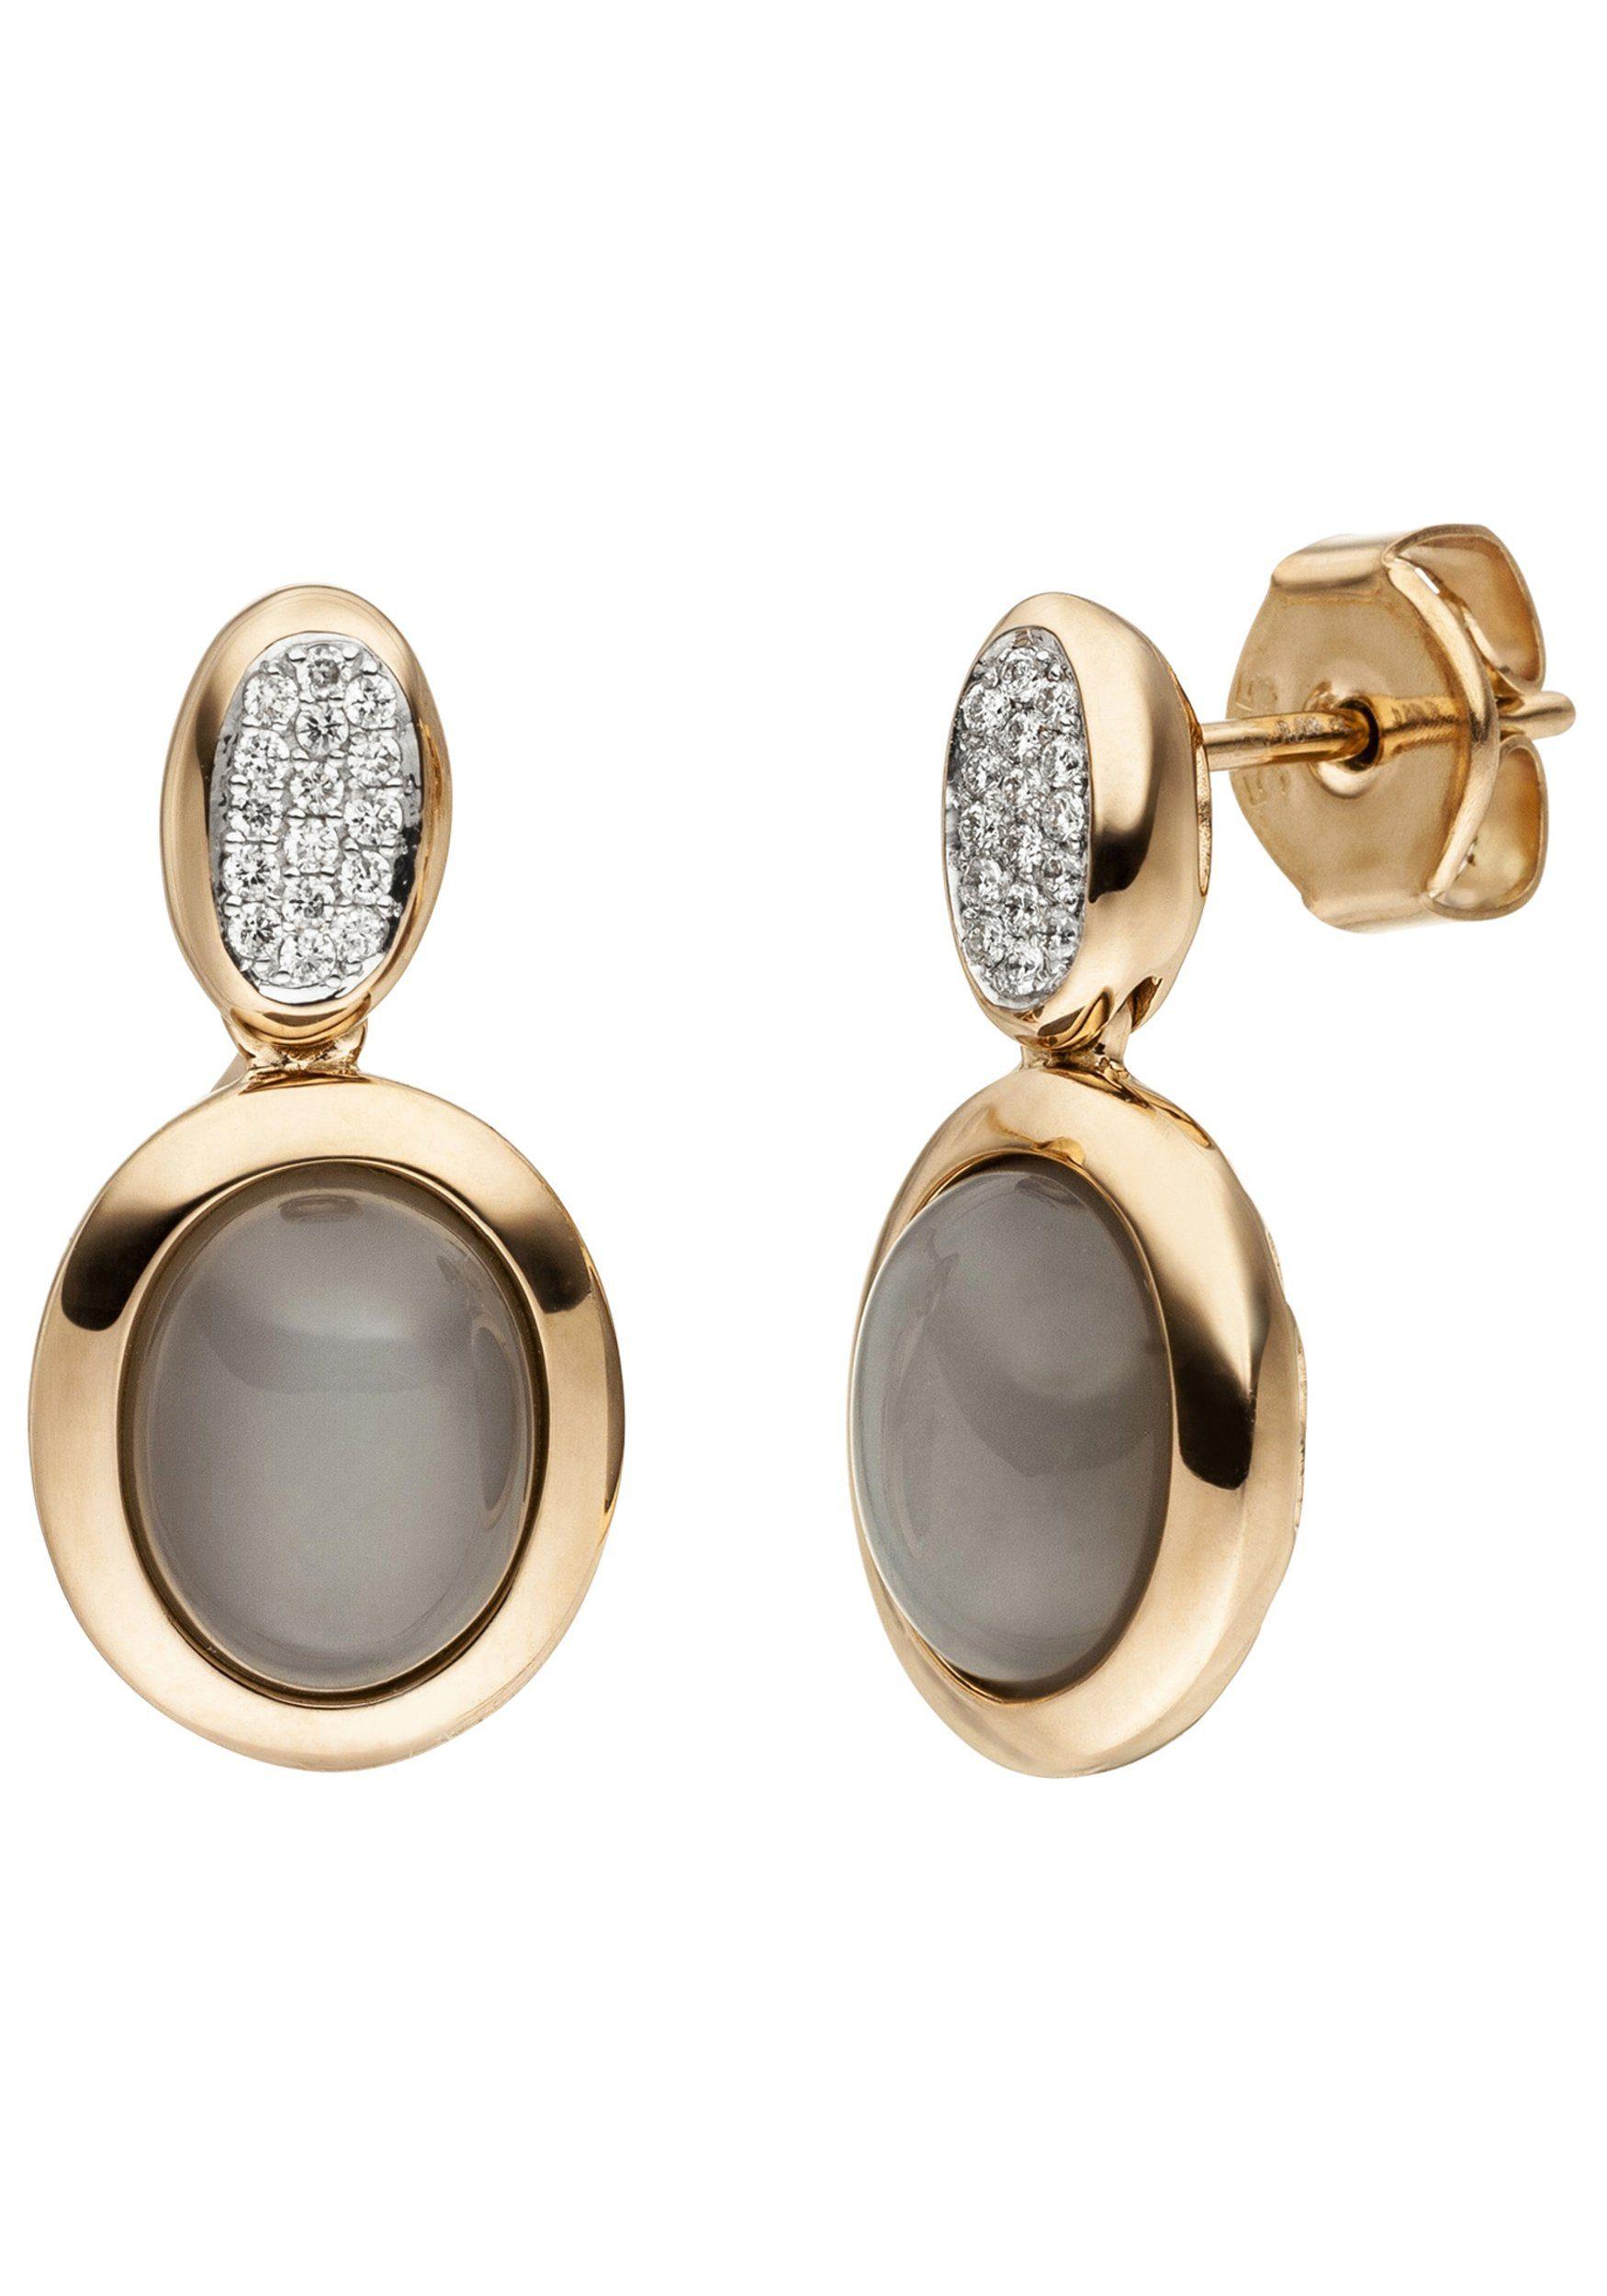 JOBO Paar Ohrstecker 585 Roségold mit 2 Mondstein Cabochons 32 Diamanten